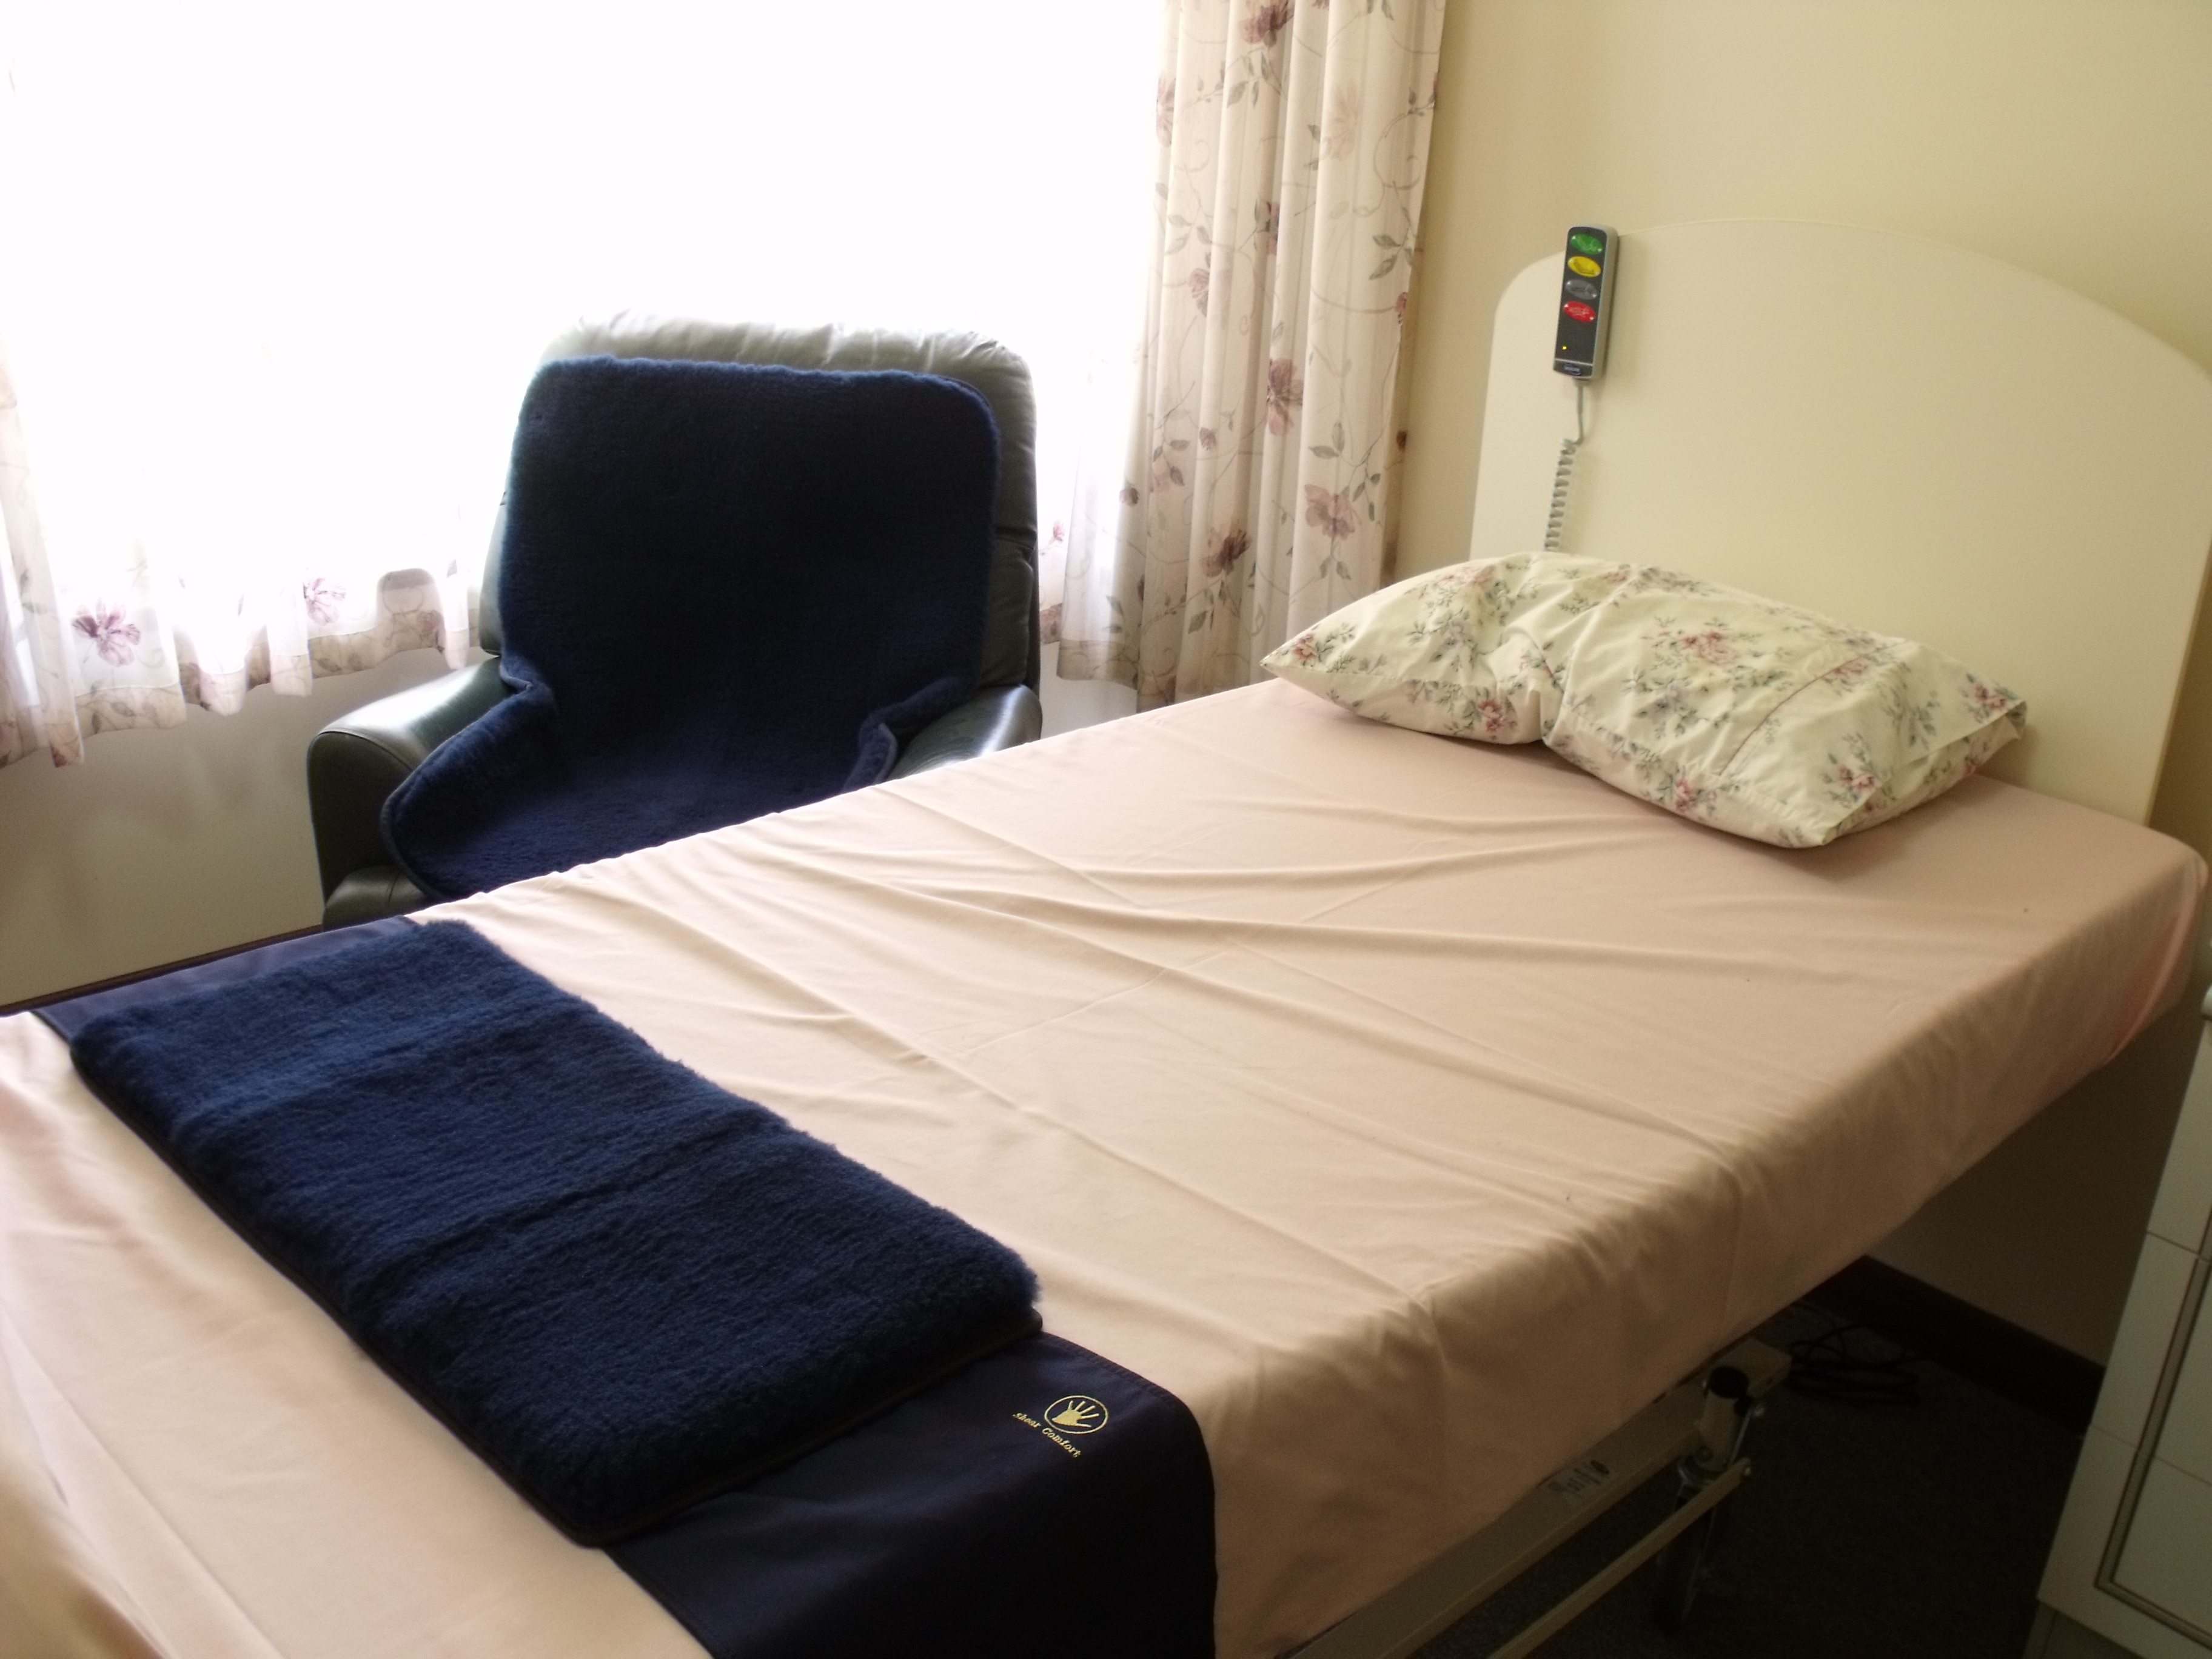 Pressure Smart Bedding